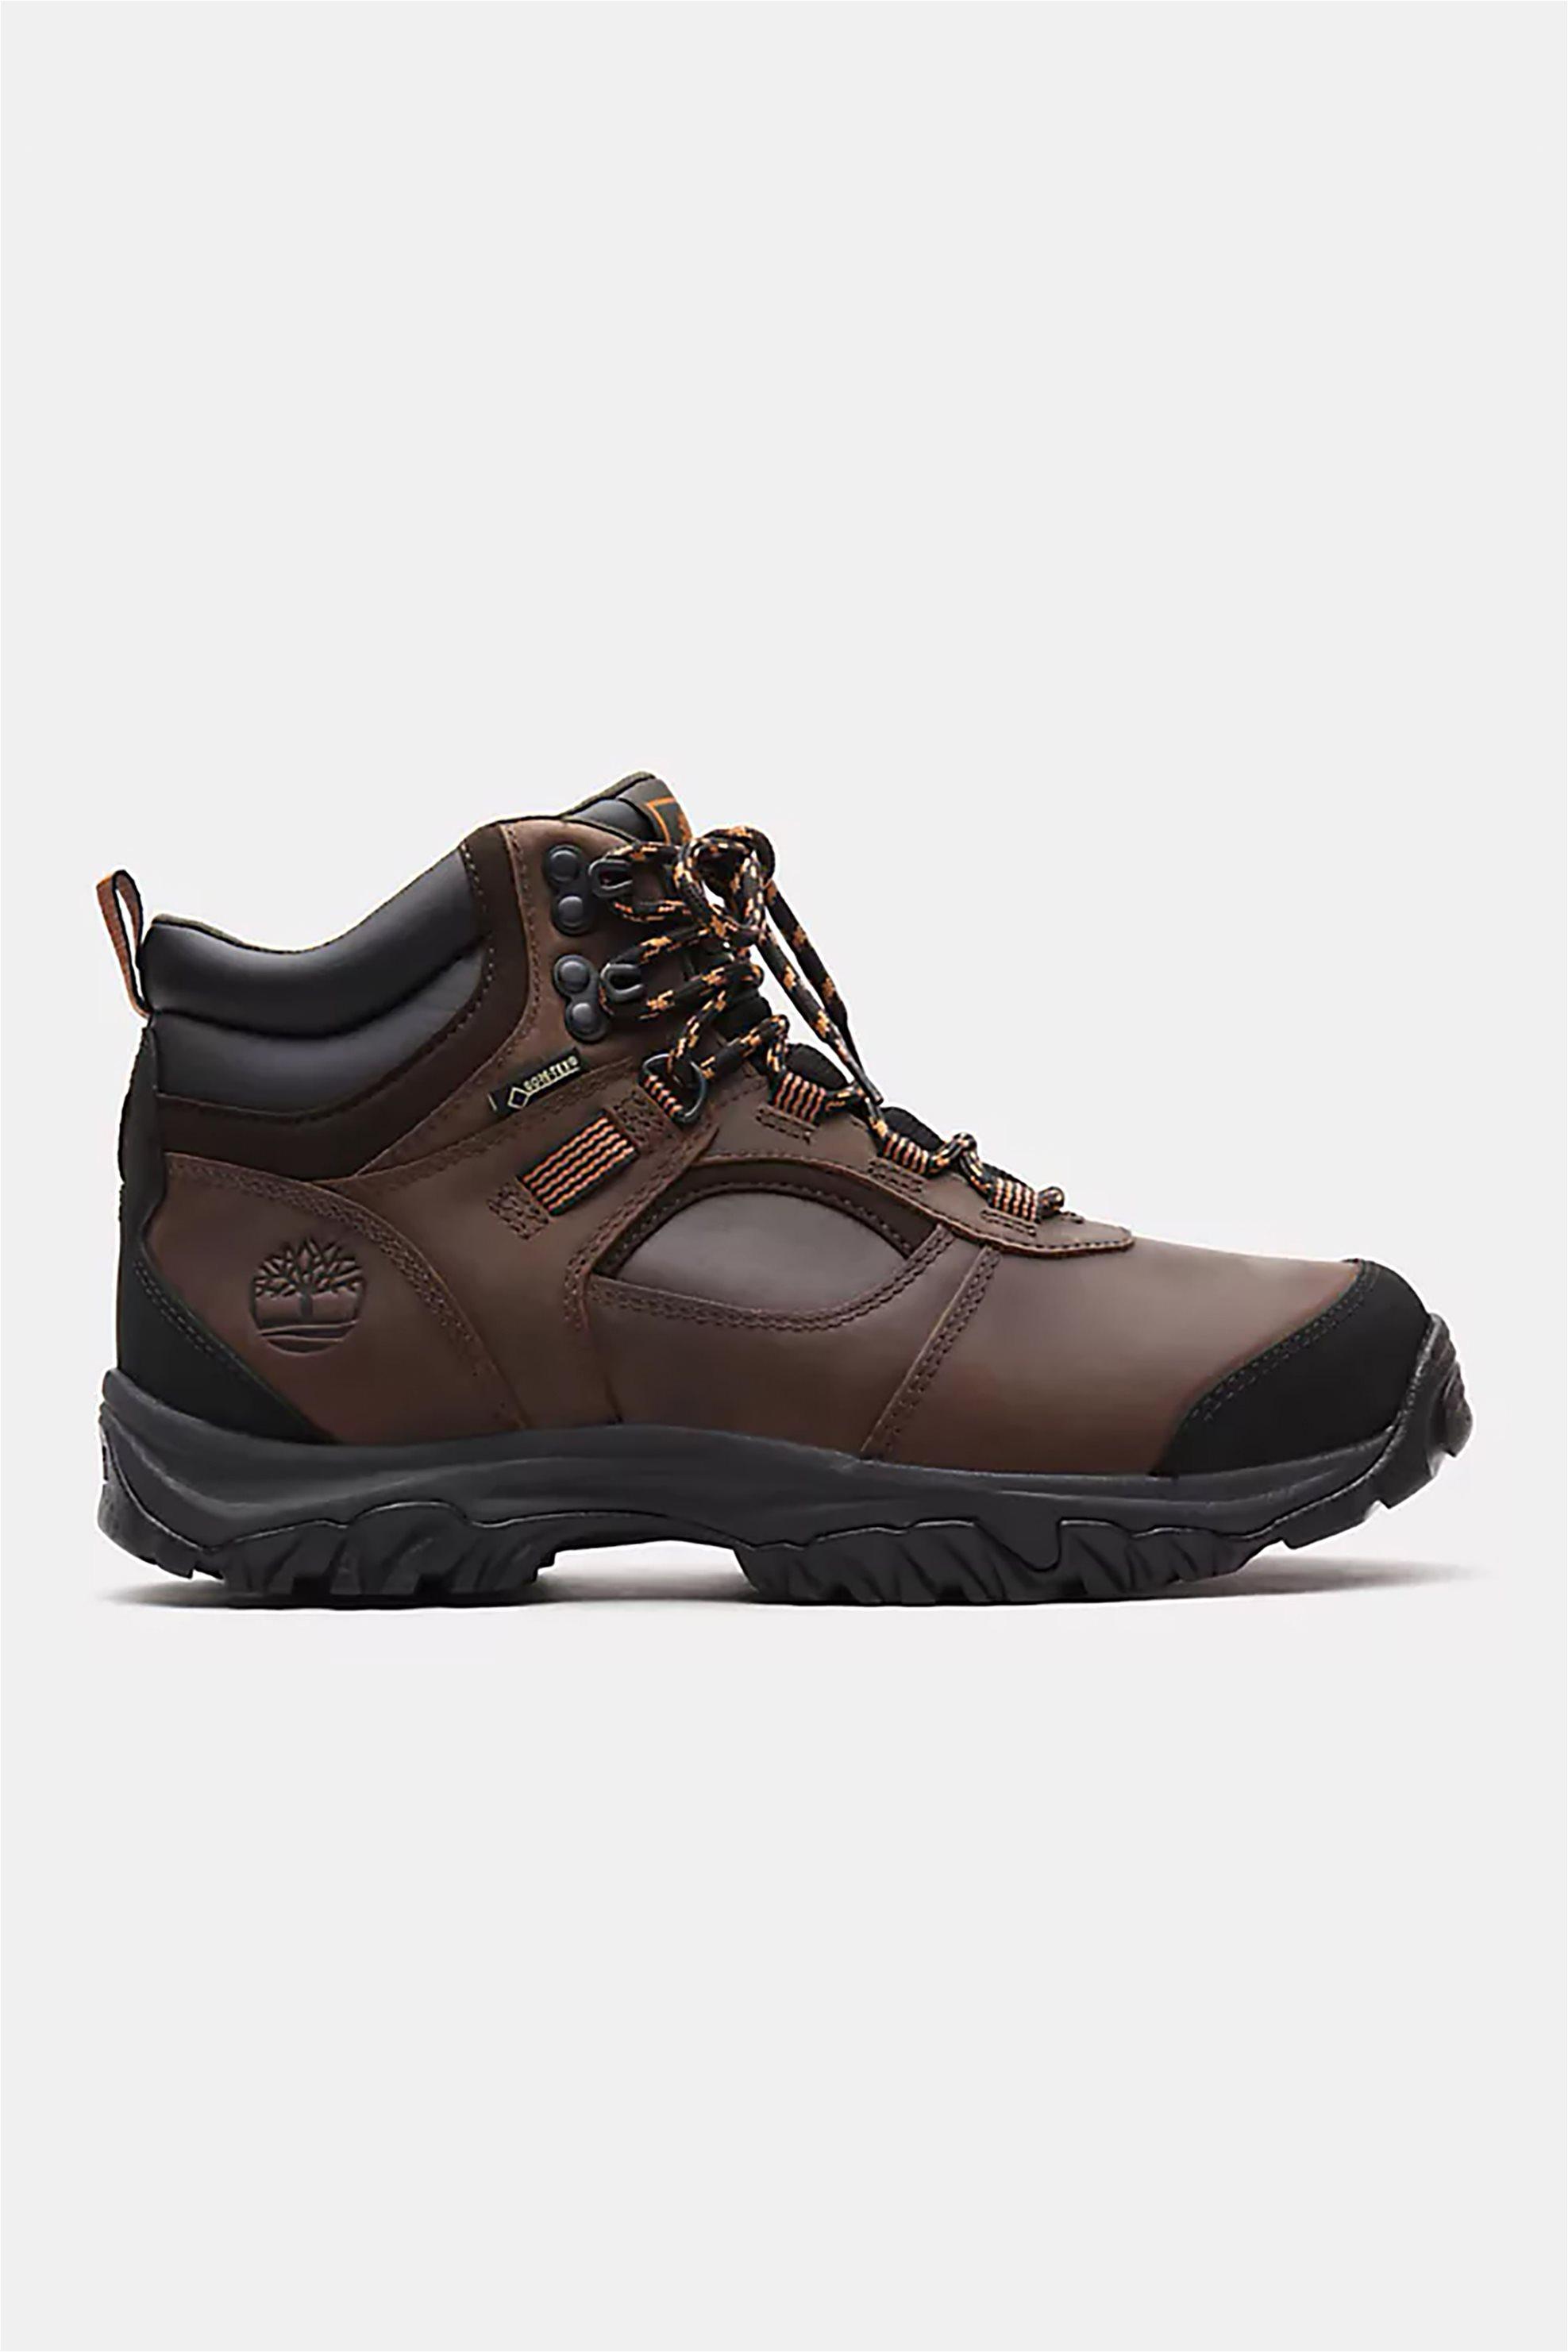 Timberland ανδρικά ορειβατικά μποτάκια «Mt. Major Gore-Tex®» – TB0A1UQQD711 – Καφέ